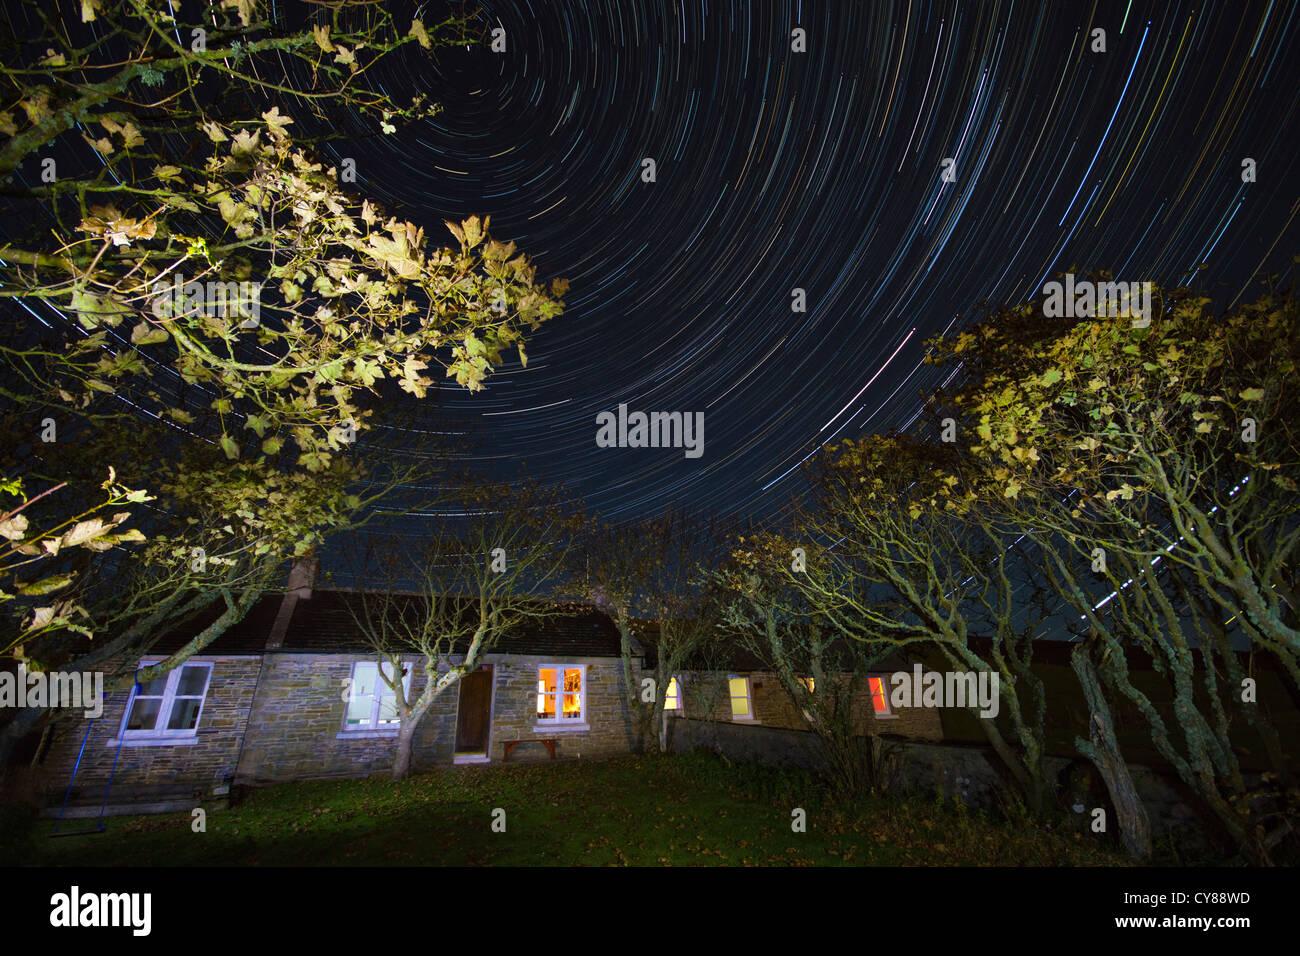 Gite rural avec star trails Photo Stock